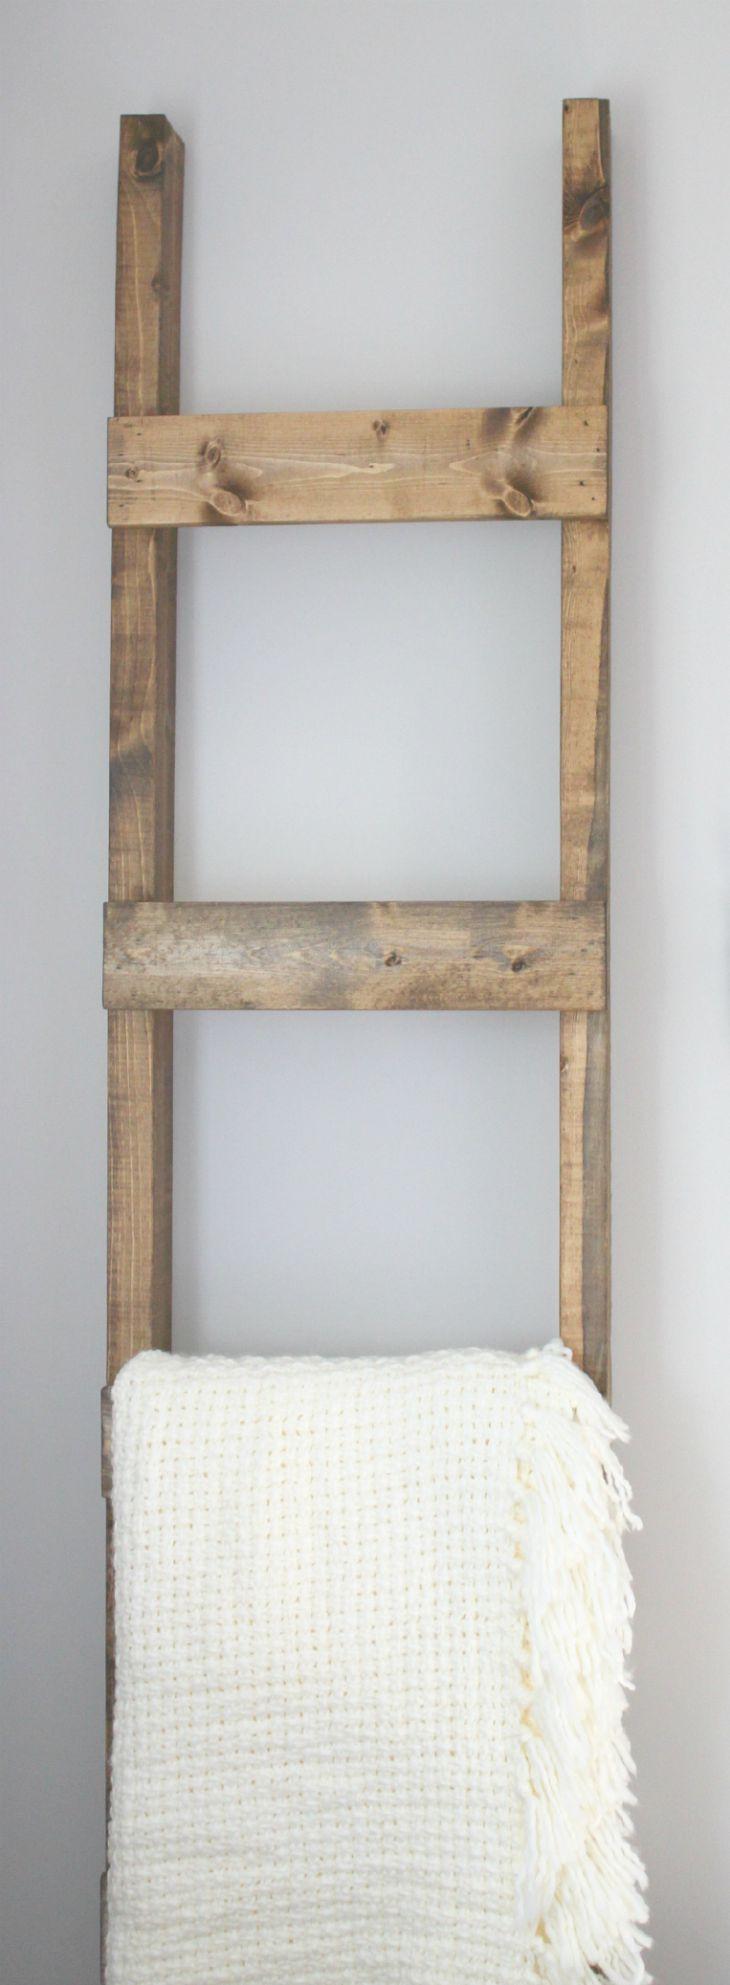 DIY Ladder Rack  30 Minute DIY Blanket Ladder